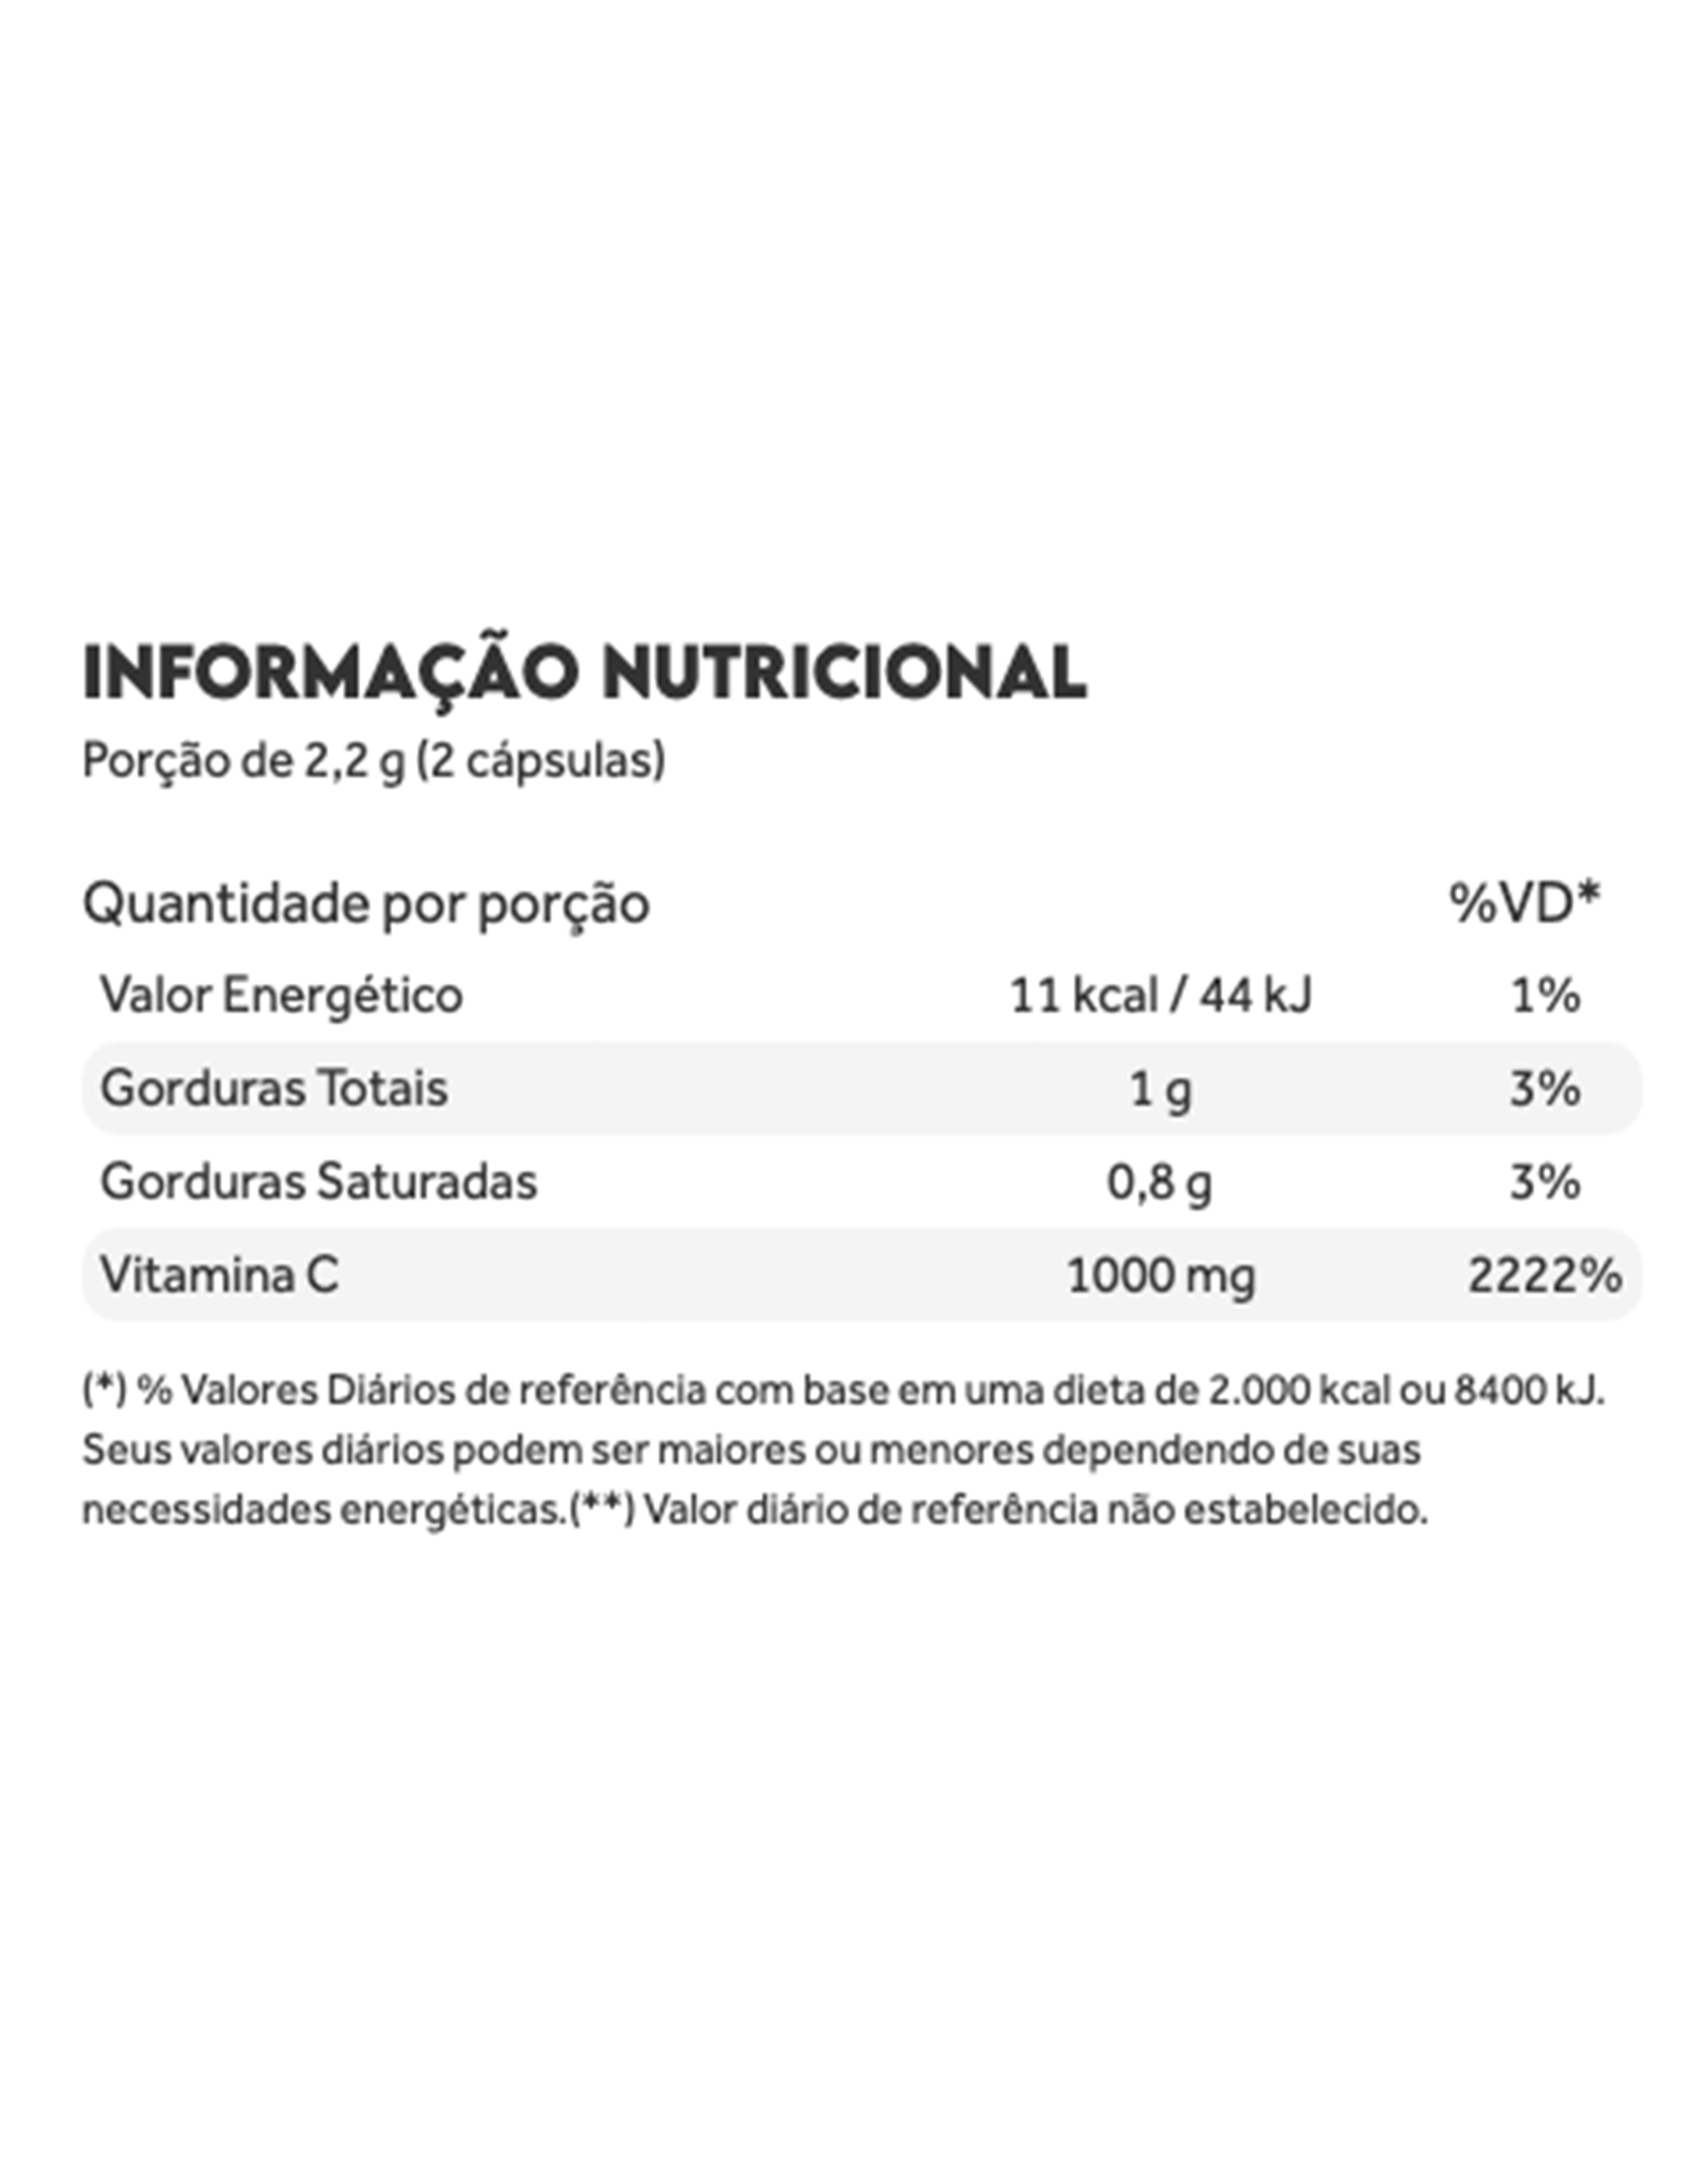 PURAVIDA VITAMINA C LIPOSSOMAL - 60 CAPSULAS